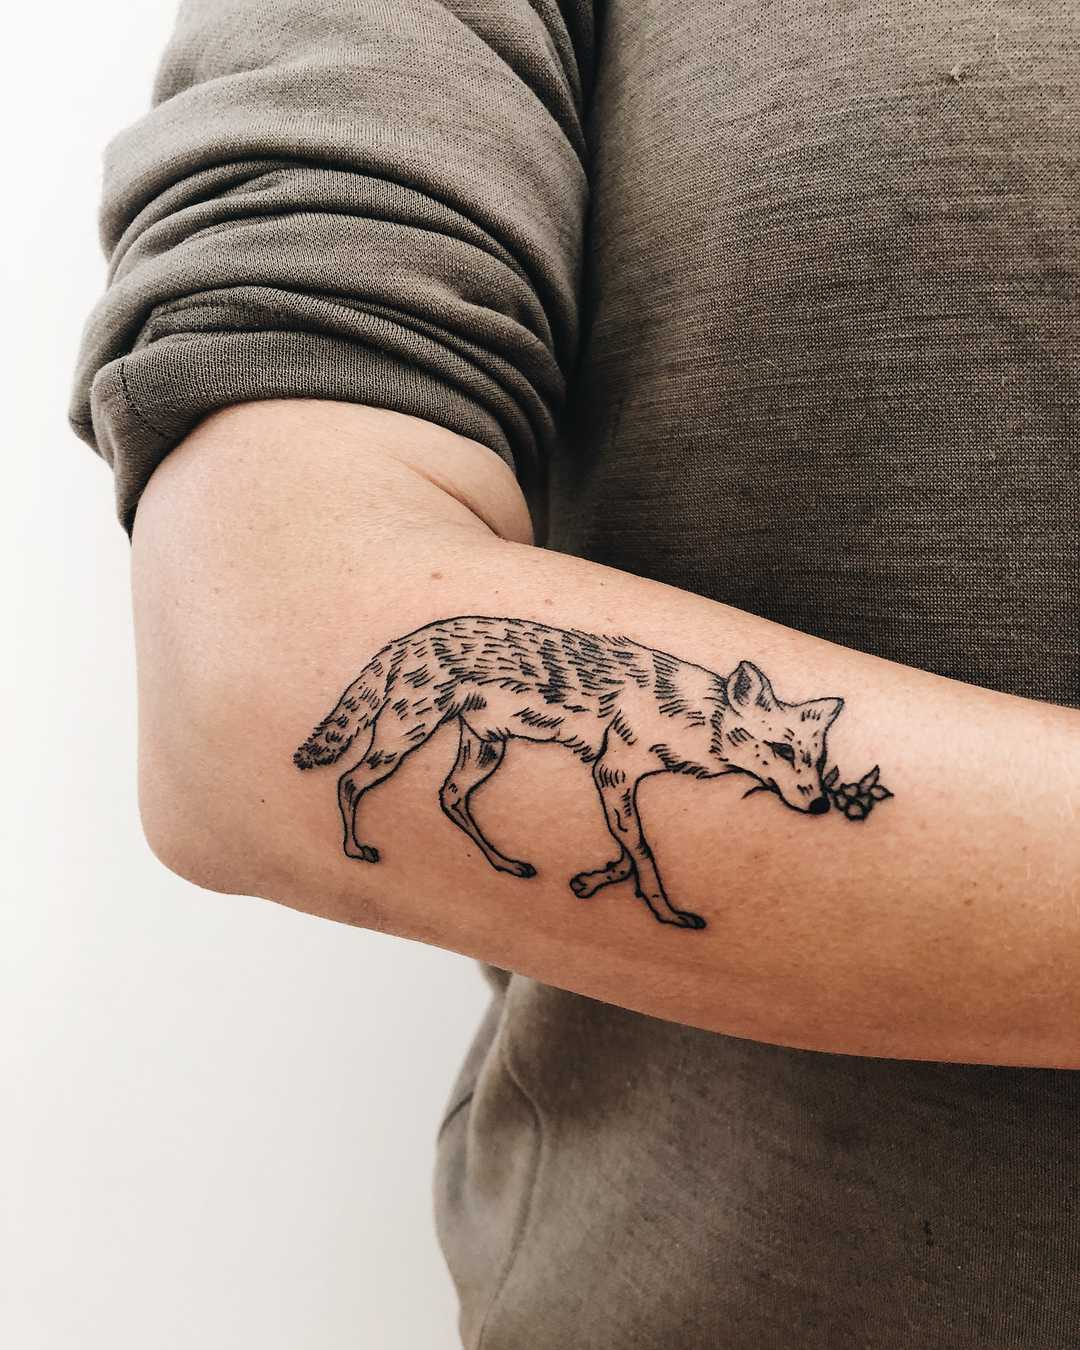 Cute fox tattoo on the forearm